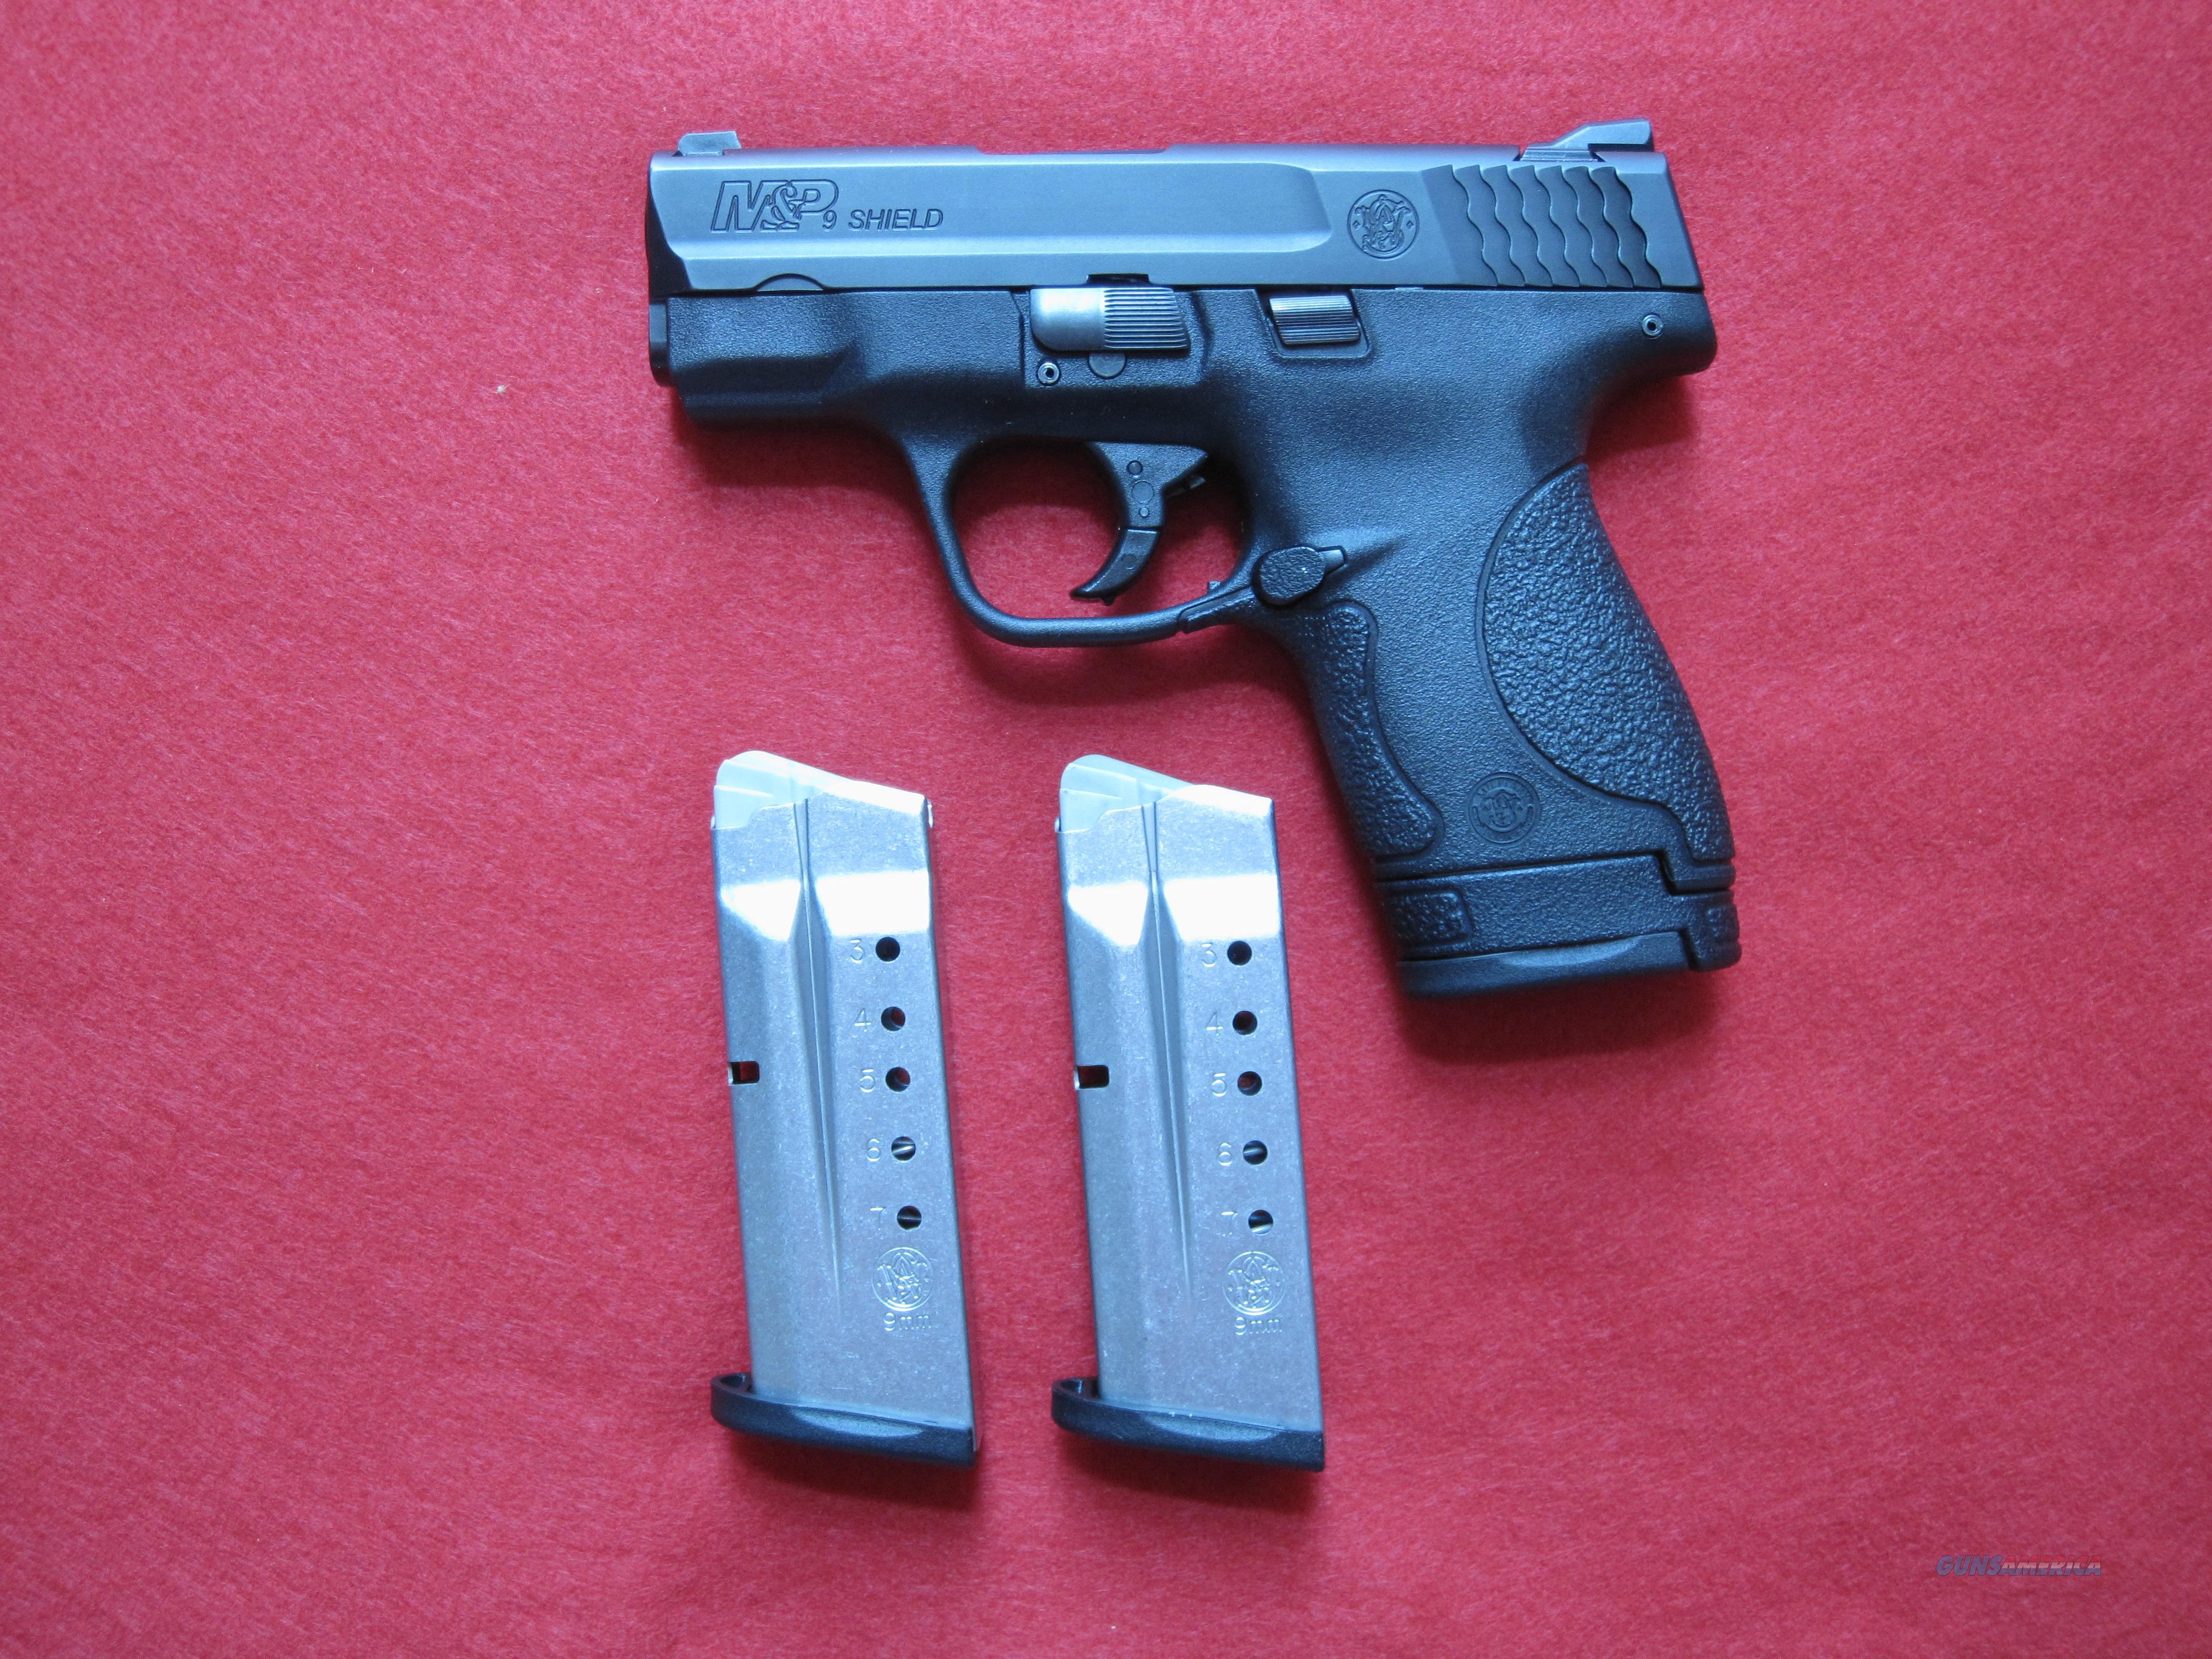 "SMITH & WESSON M&P SHIELD, 9MM, 3.1"" BARREL  Guns > Pistols > Smith & Wesson Pistols - Autos > Shield"